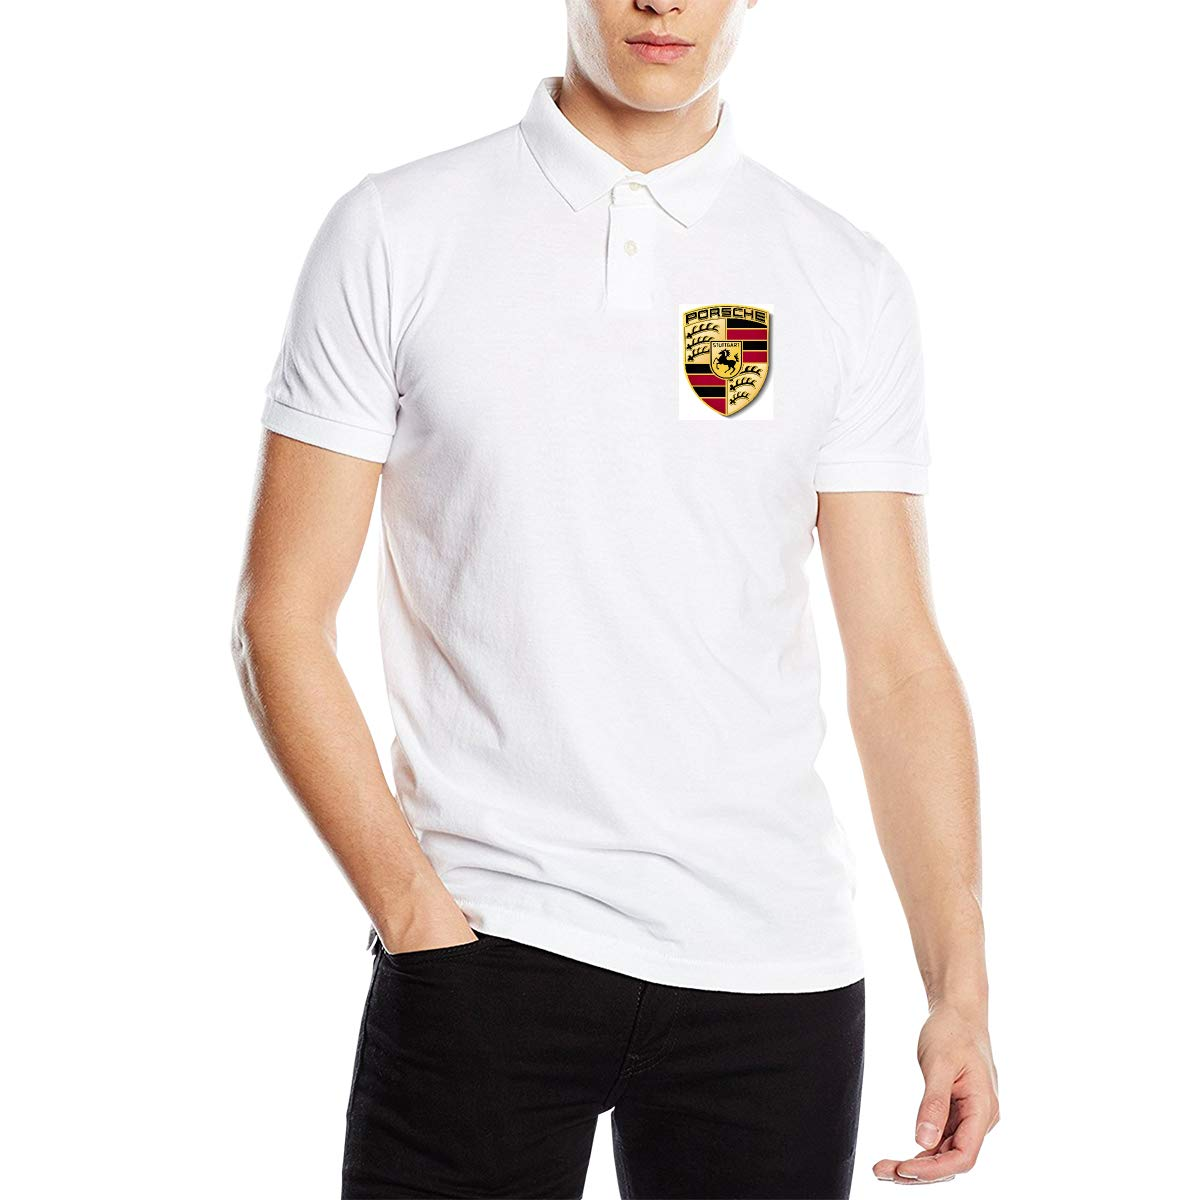 Jianju Mens Customized Comfortable General Motorsporsche Logo Short Sleeve New Polo Shirts White